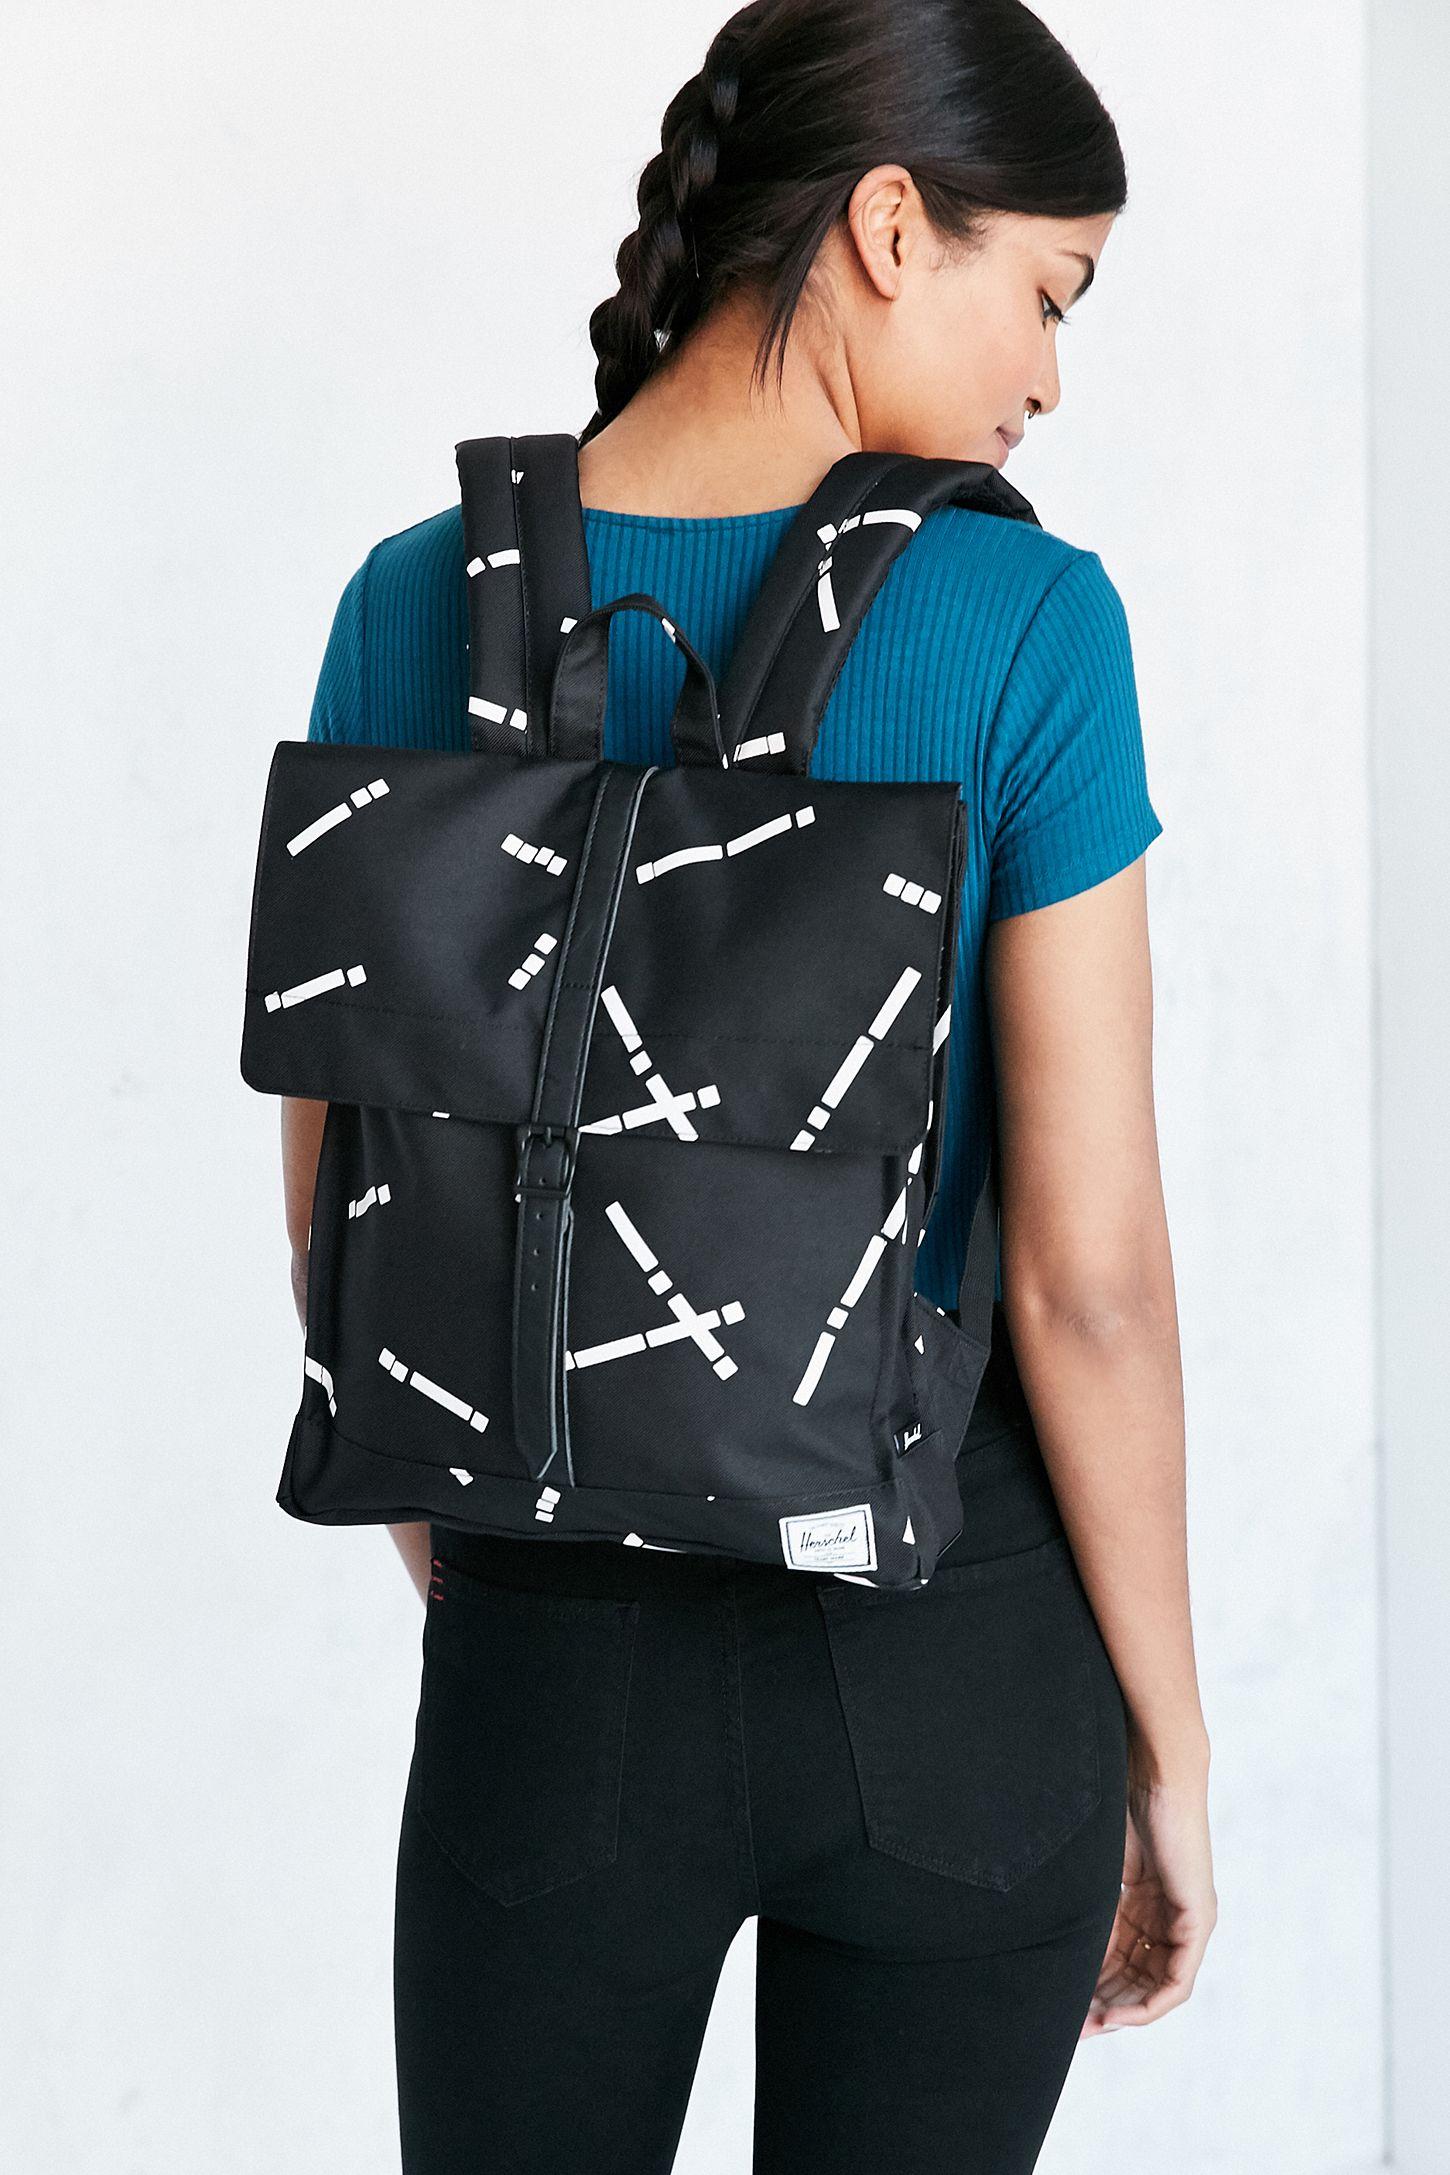 e46292b54f Herschel Supply Co. City Backpack